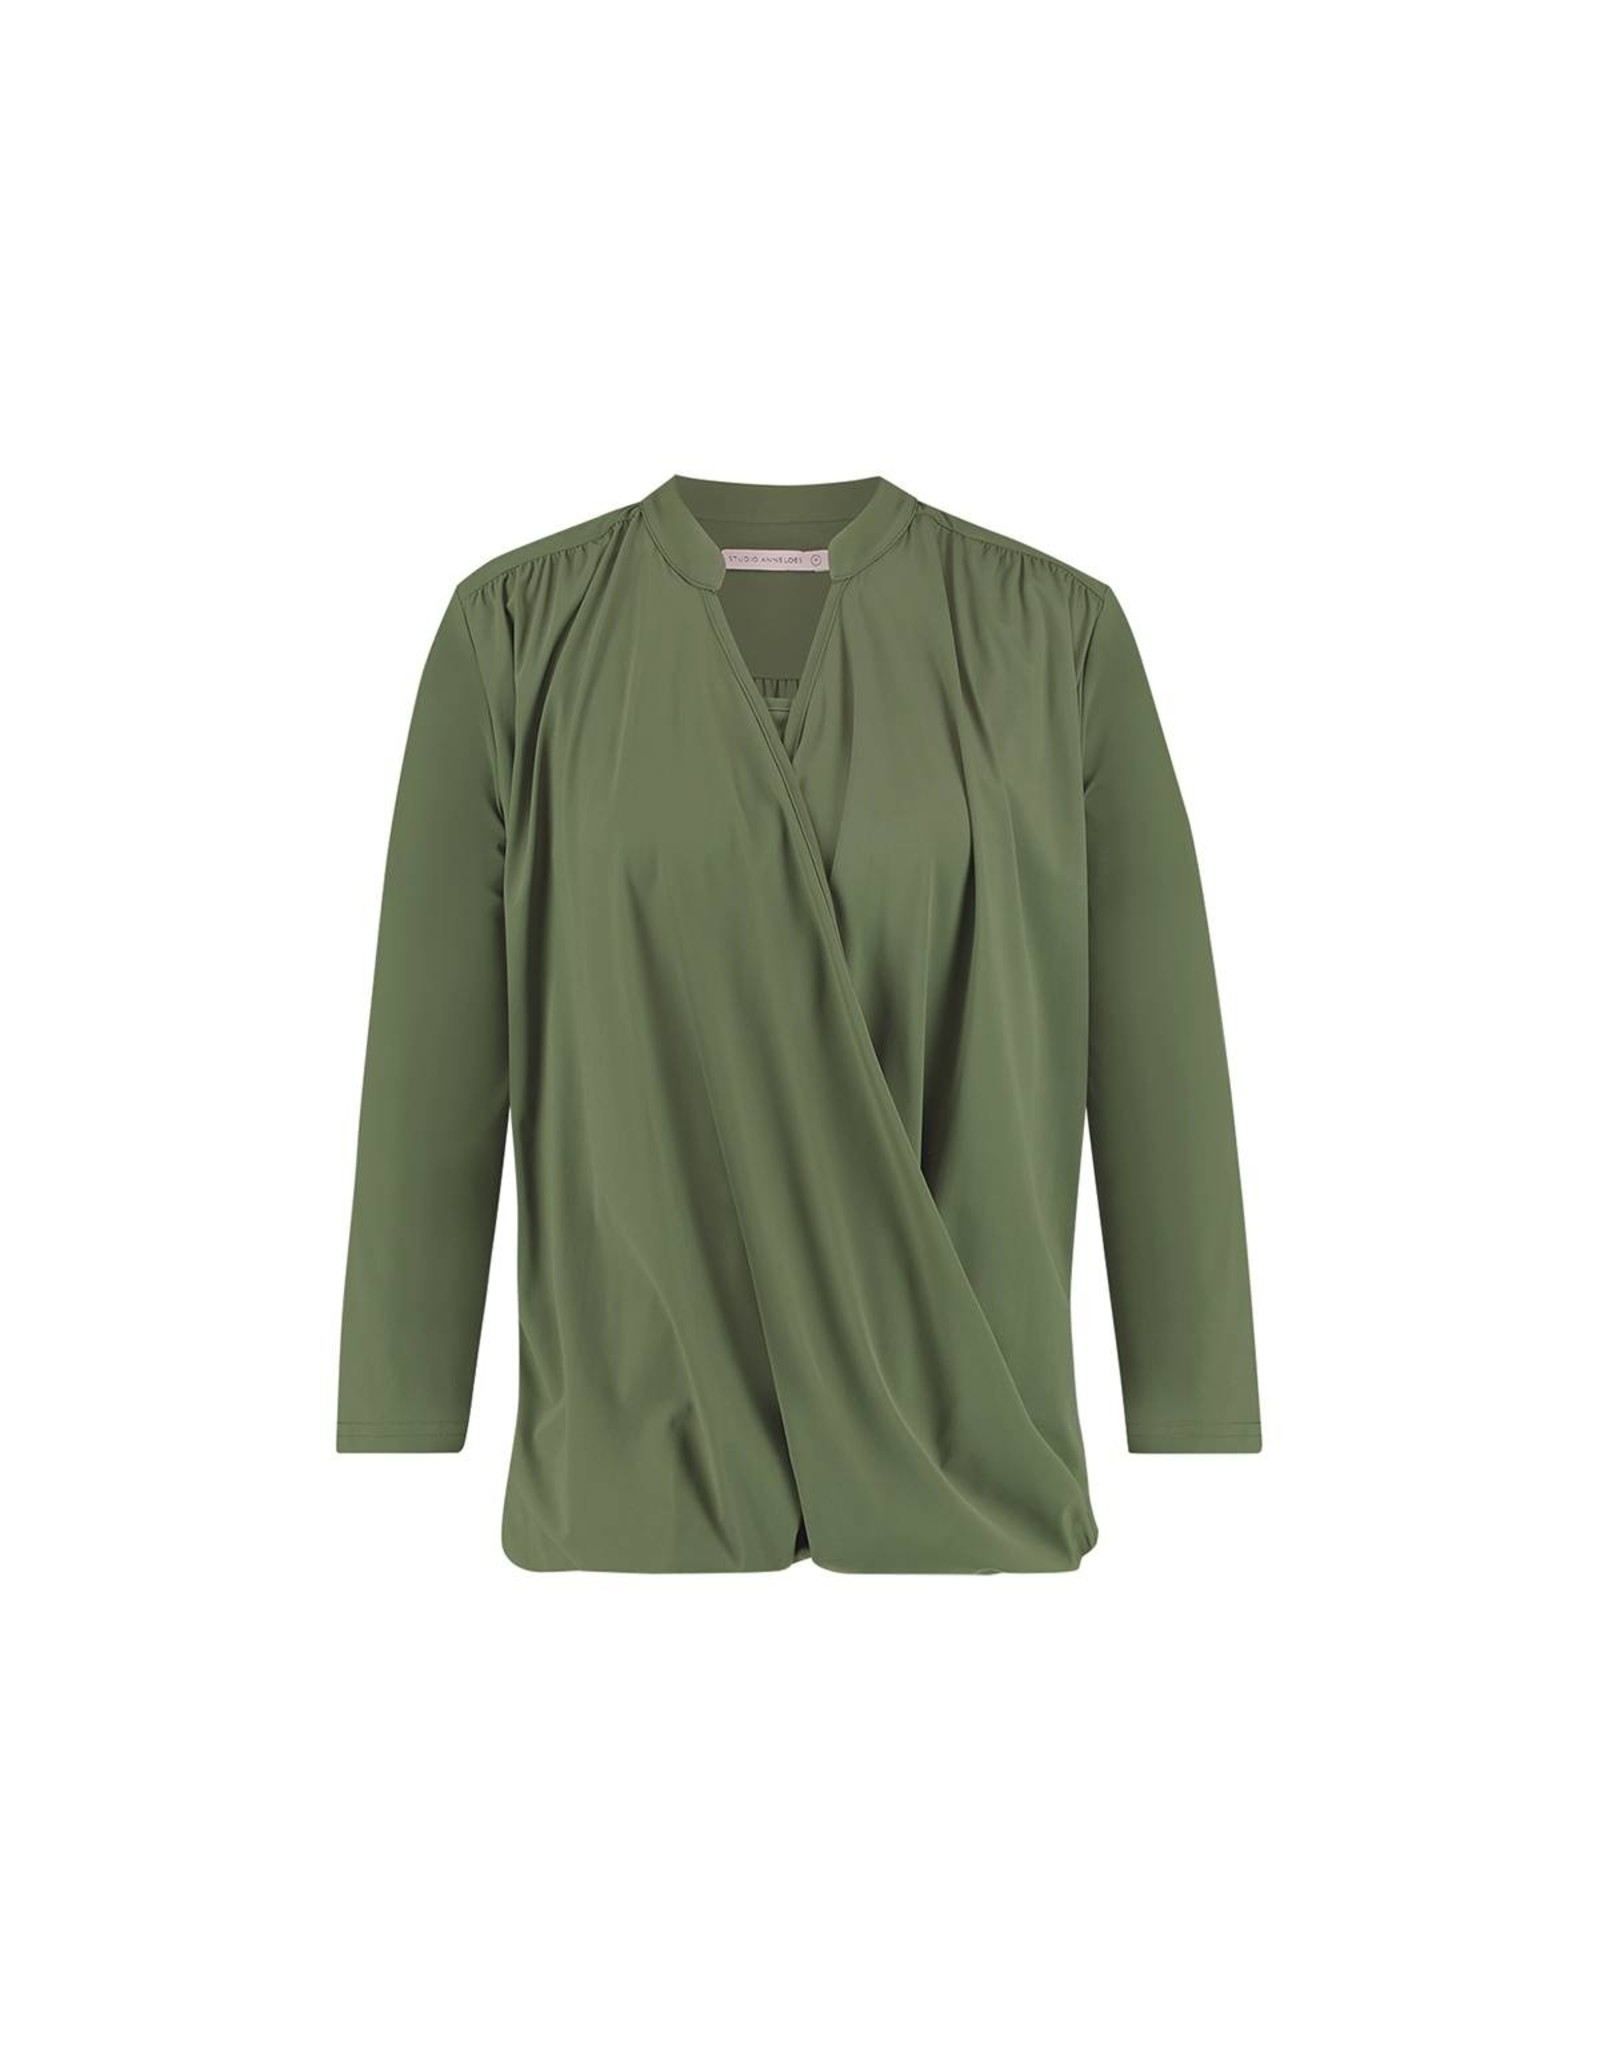 Studio Anneloes diara shirt 04326